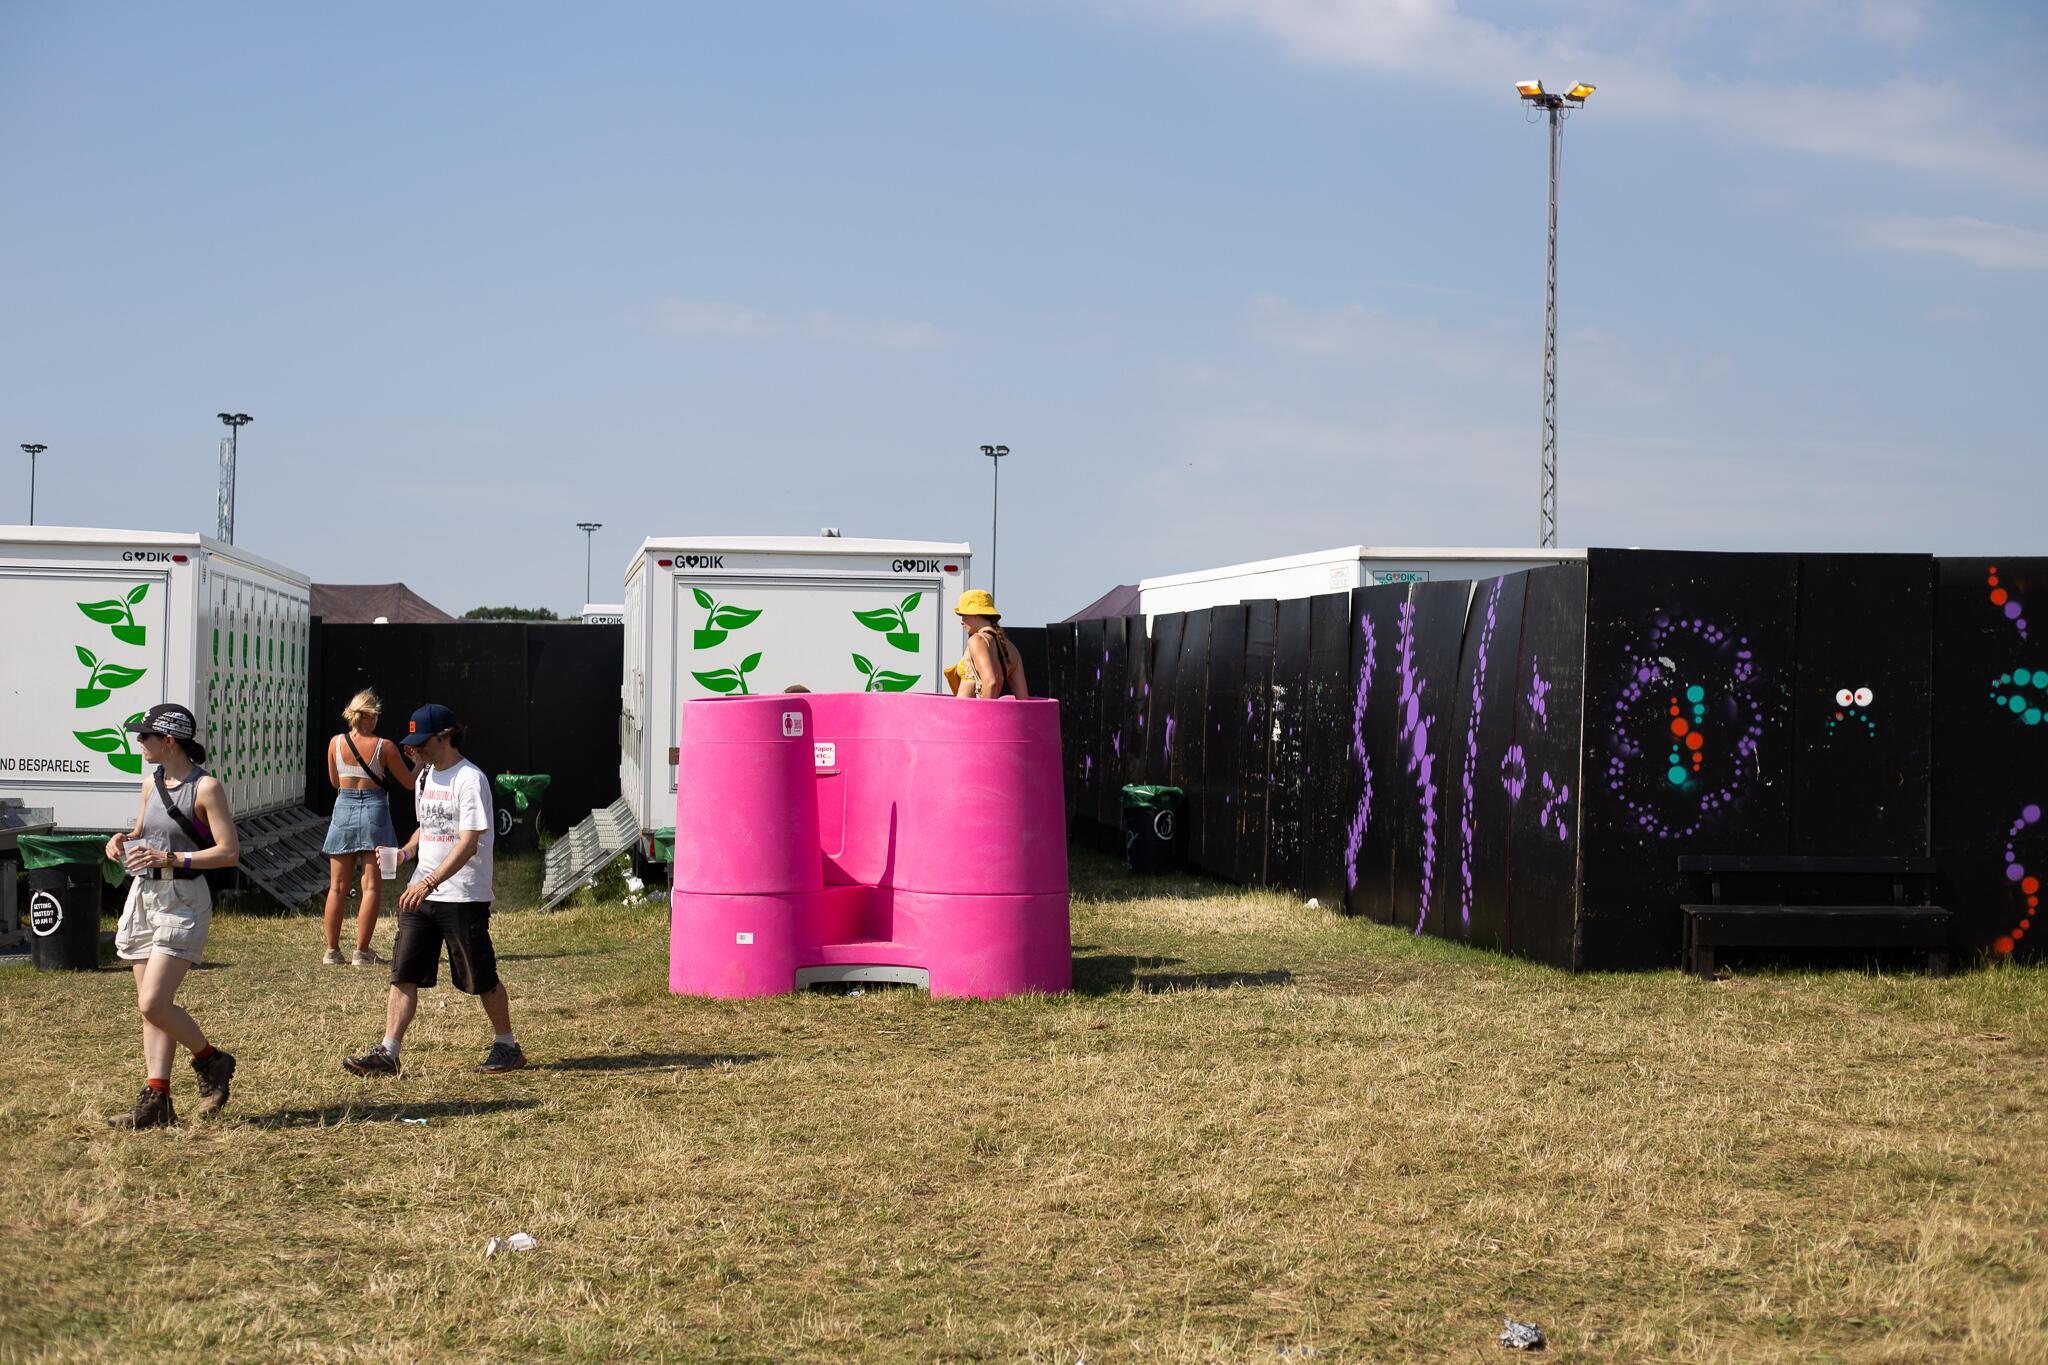 Toilettes instalados no Musica Festivals